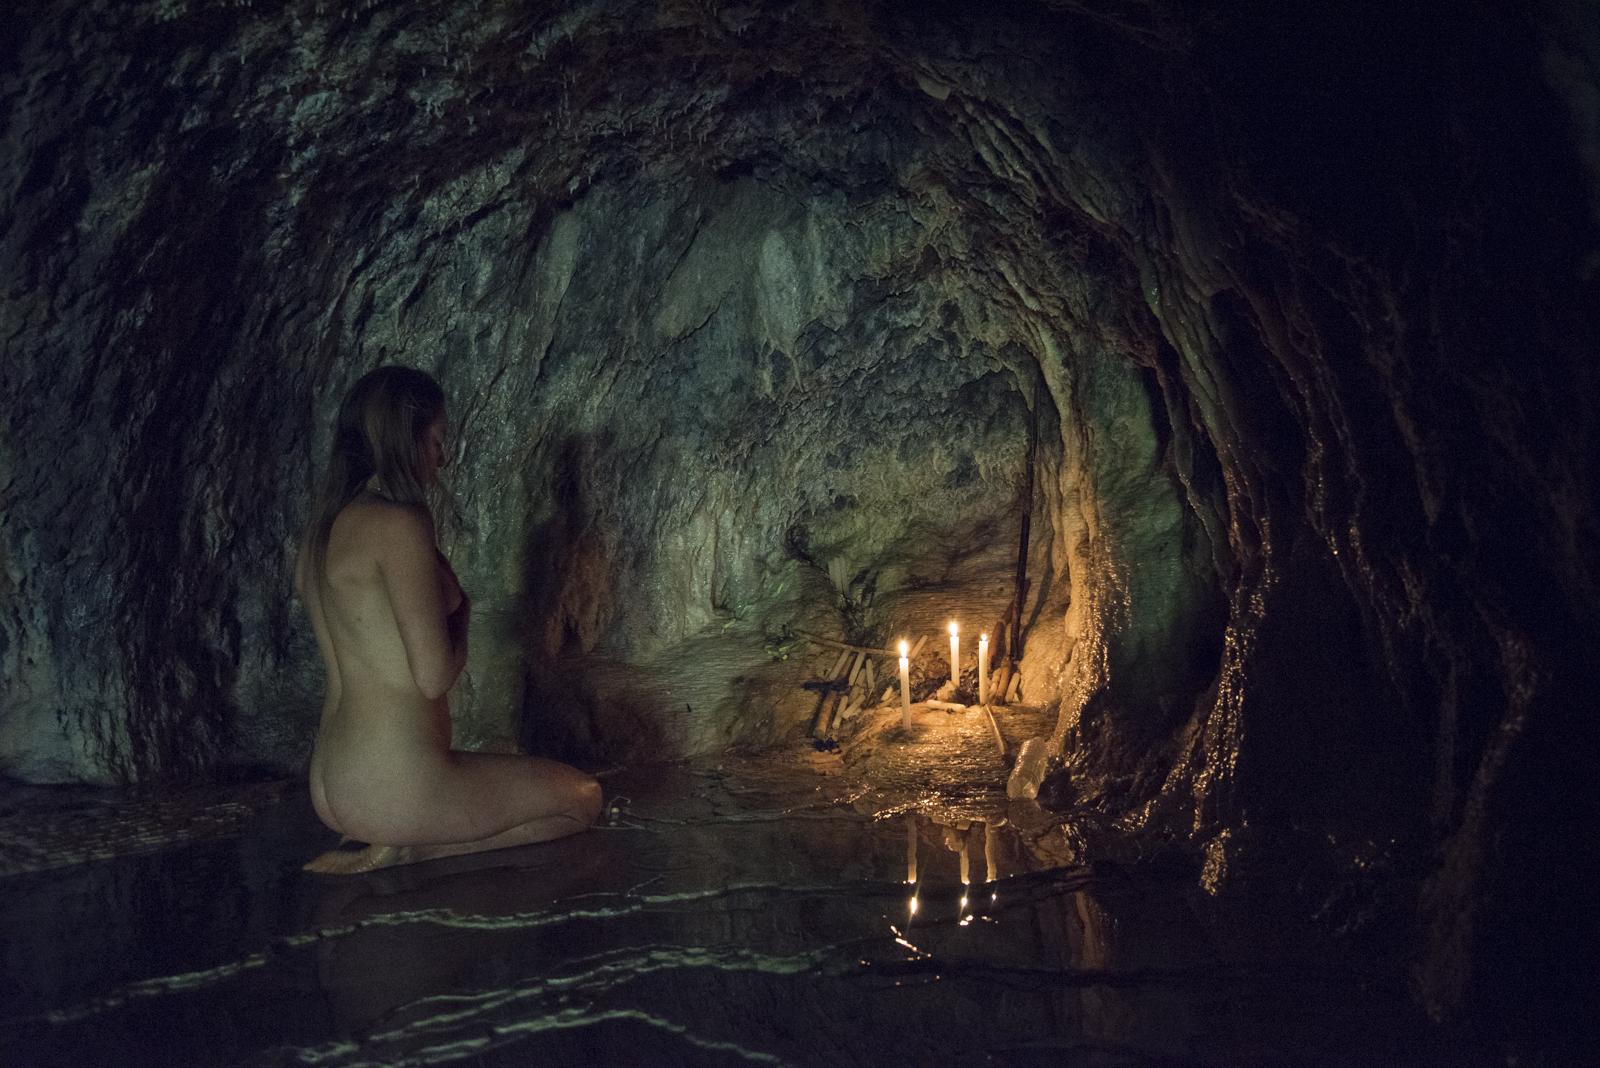 Ceremony in the sacred cave #clairesashine #photography #Mexico #travel #nomadlife #welivetoexplore #wildwomen #goddess #witch #shaman #sheexplores #magic #wildwoman #pachamama #womenempowerment  #nude #goddessrising #sacredfeminine  #spiritual #conscious #cave #nomad #ceremony #sisterhood #artphotography #women